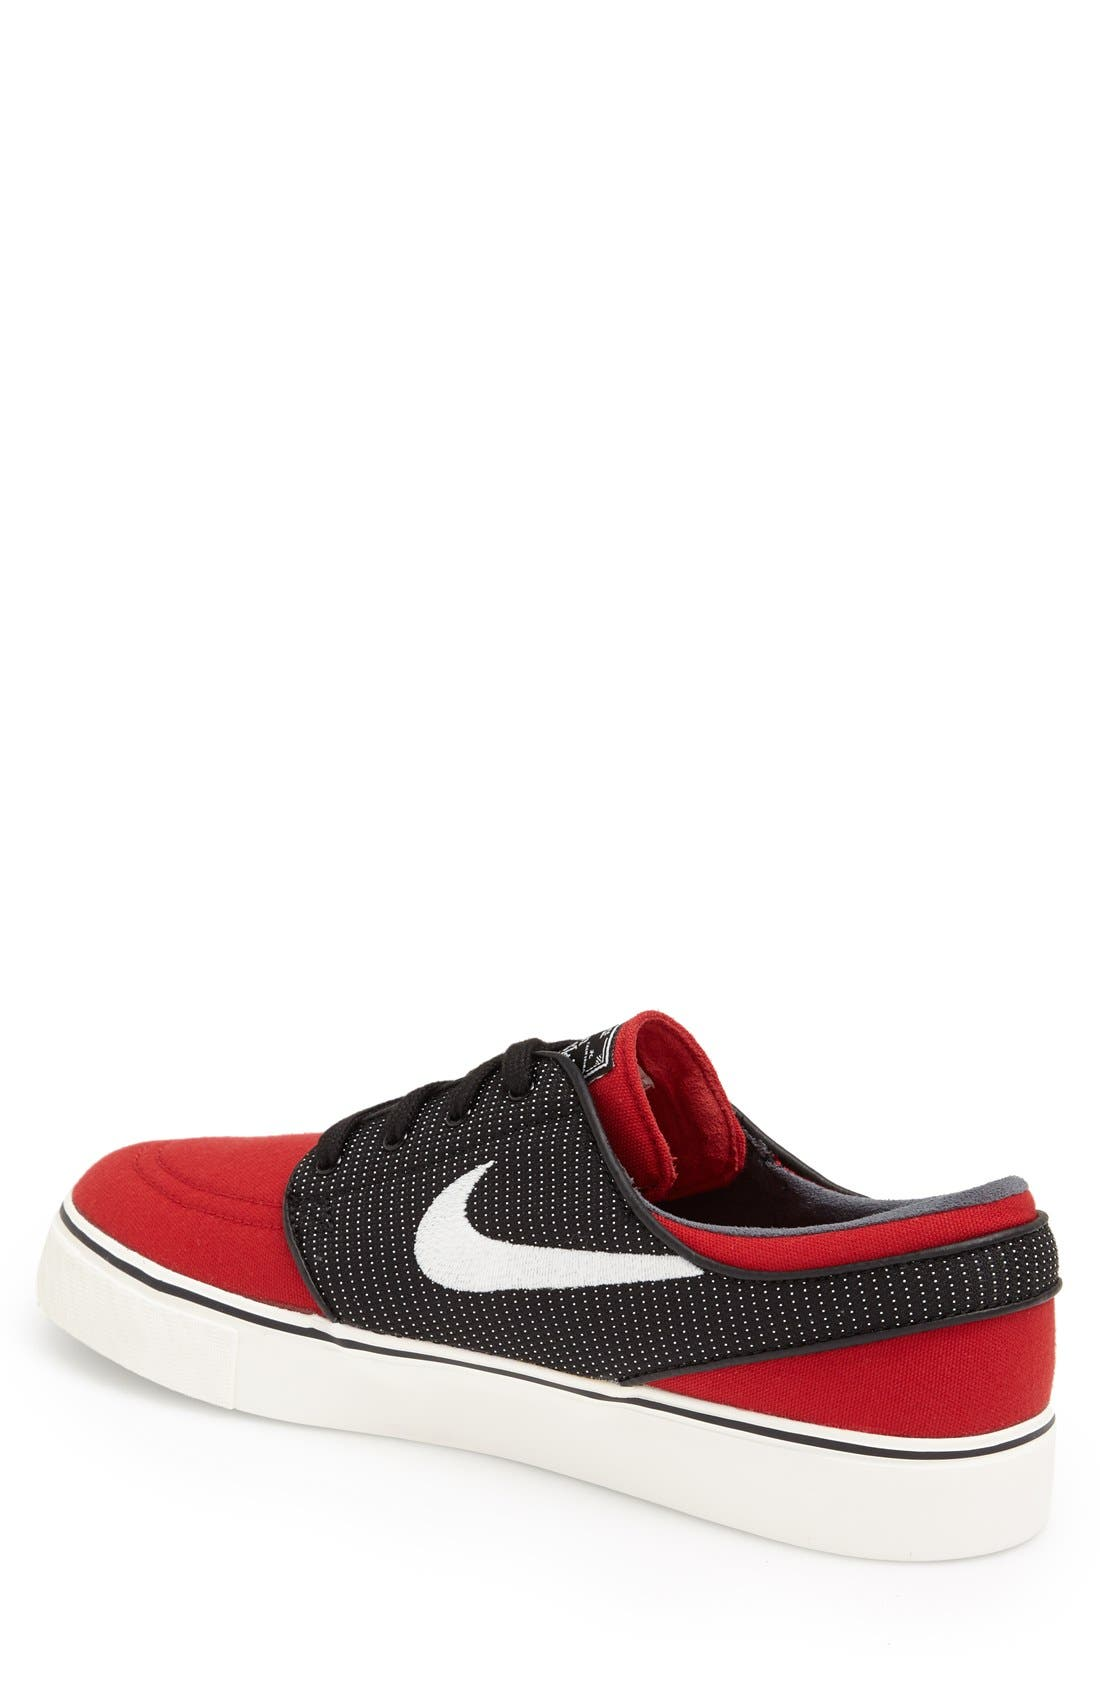 Zoom - Stefan Janoski SB Canvas Skate Shoe,                             Alternate thumbnail 82, color,